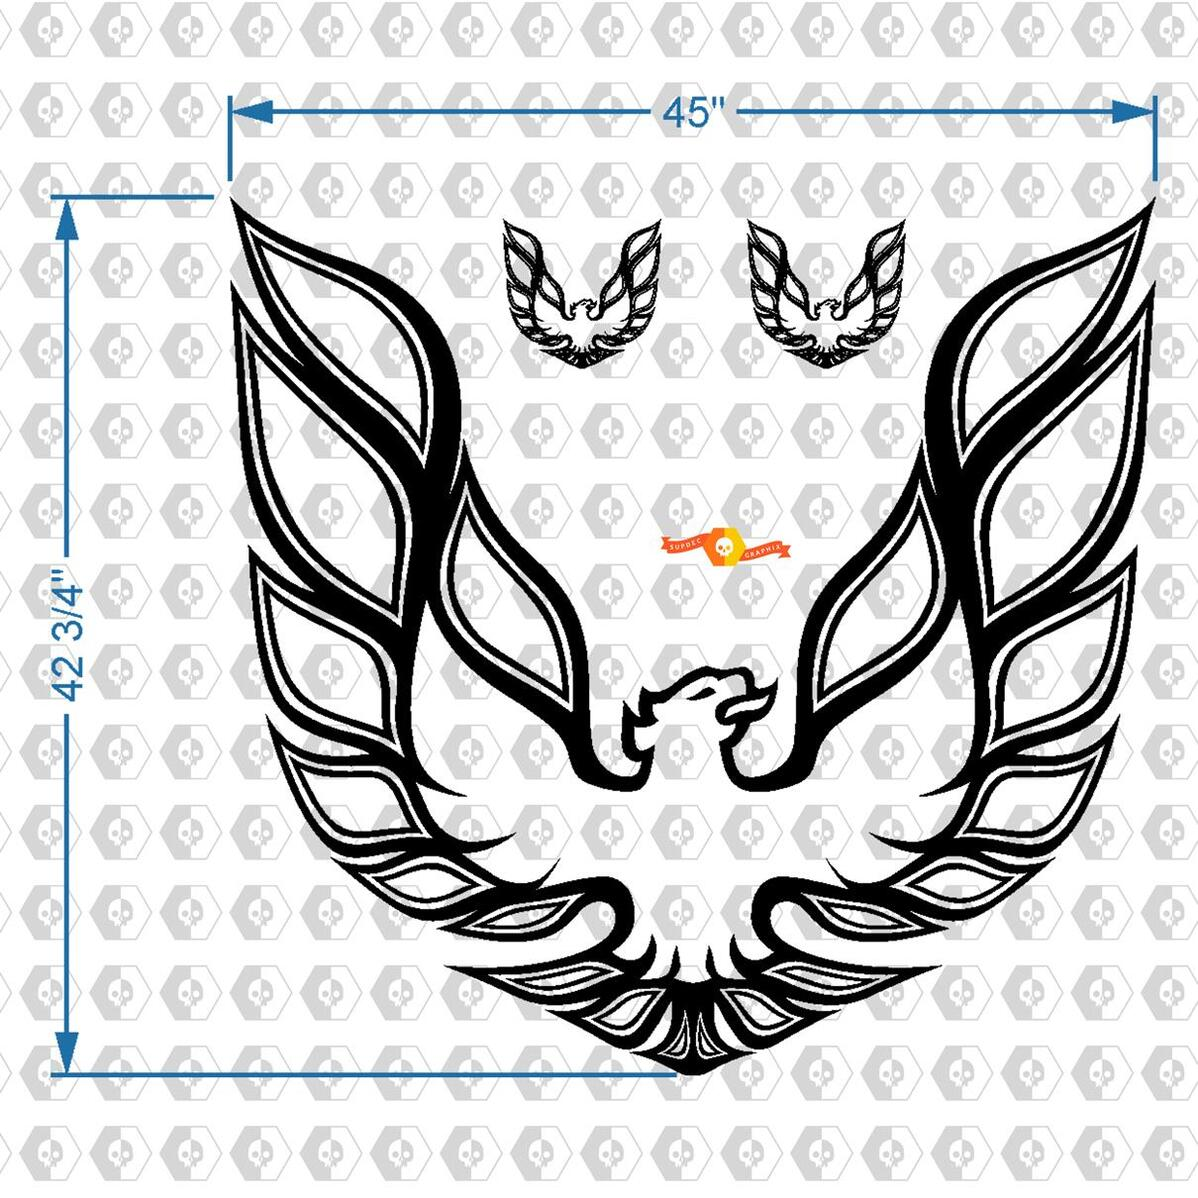 Firebird Trans Am Pontiac Hood Vogel Aufkleber Grafik Jede Farbe 45 x 42